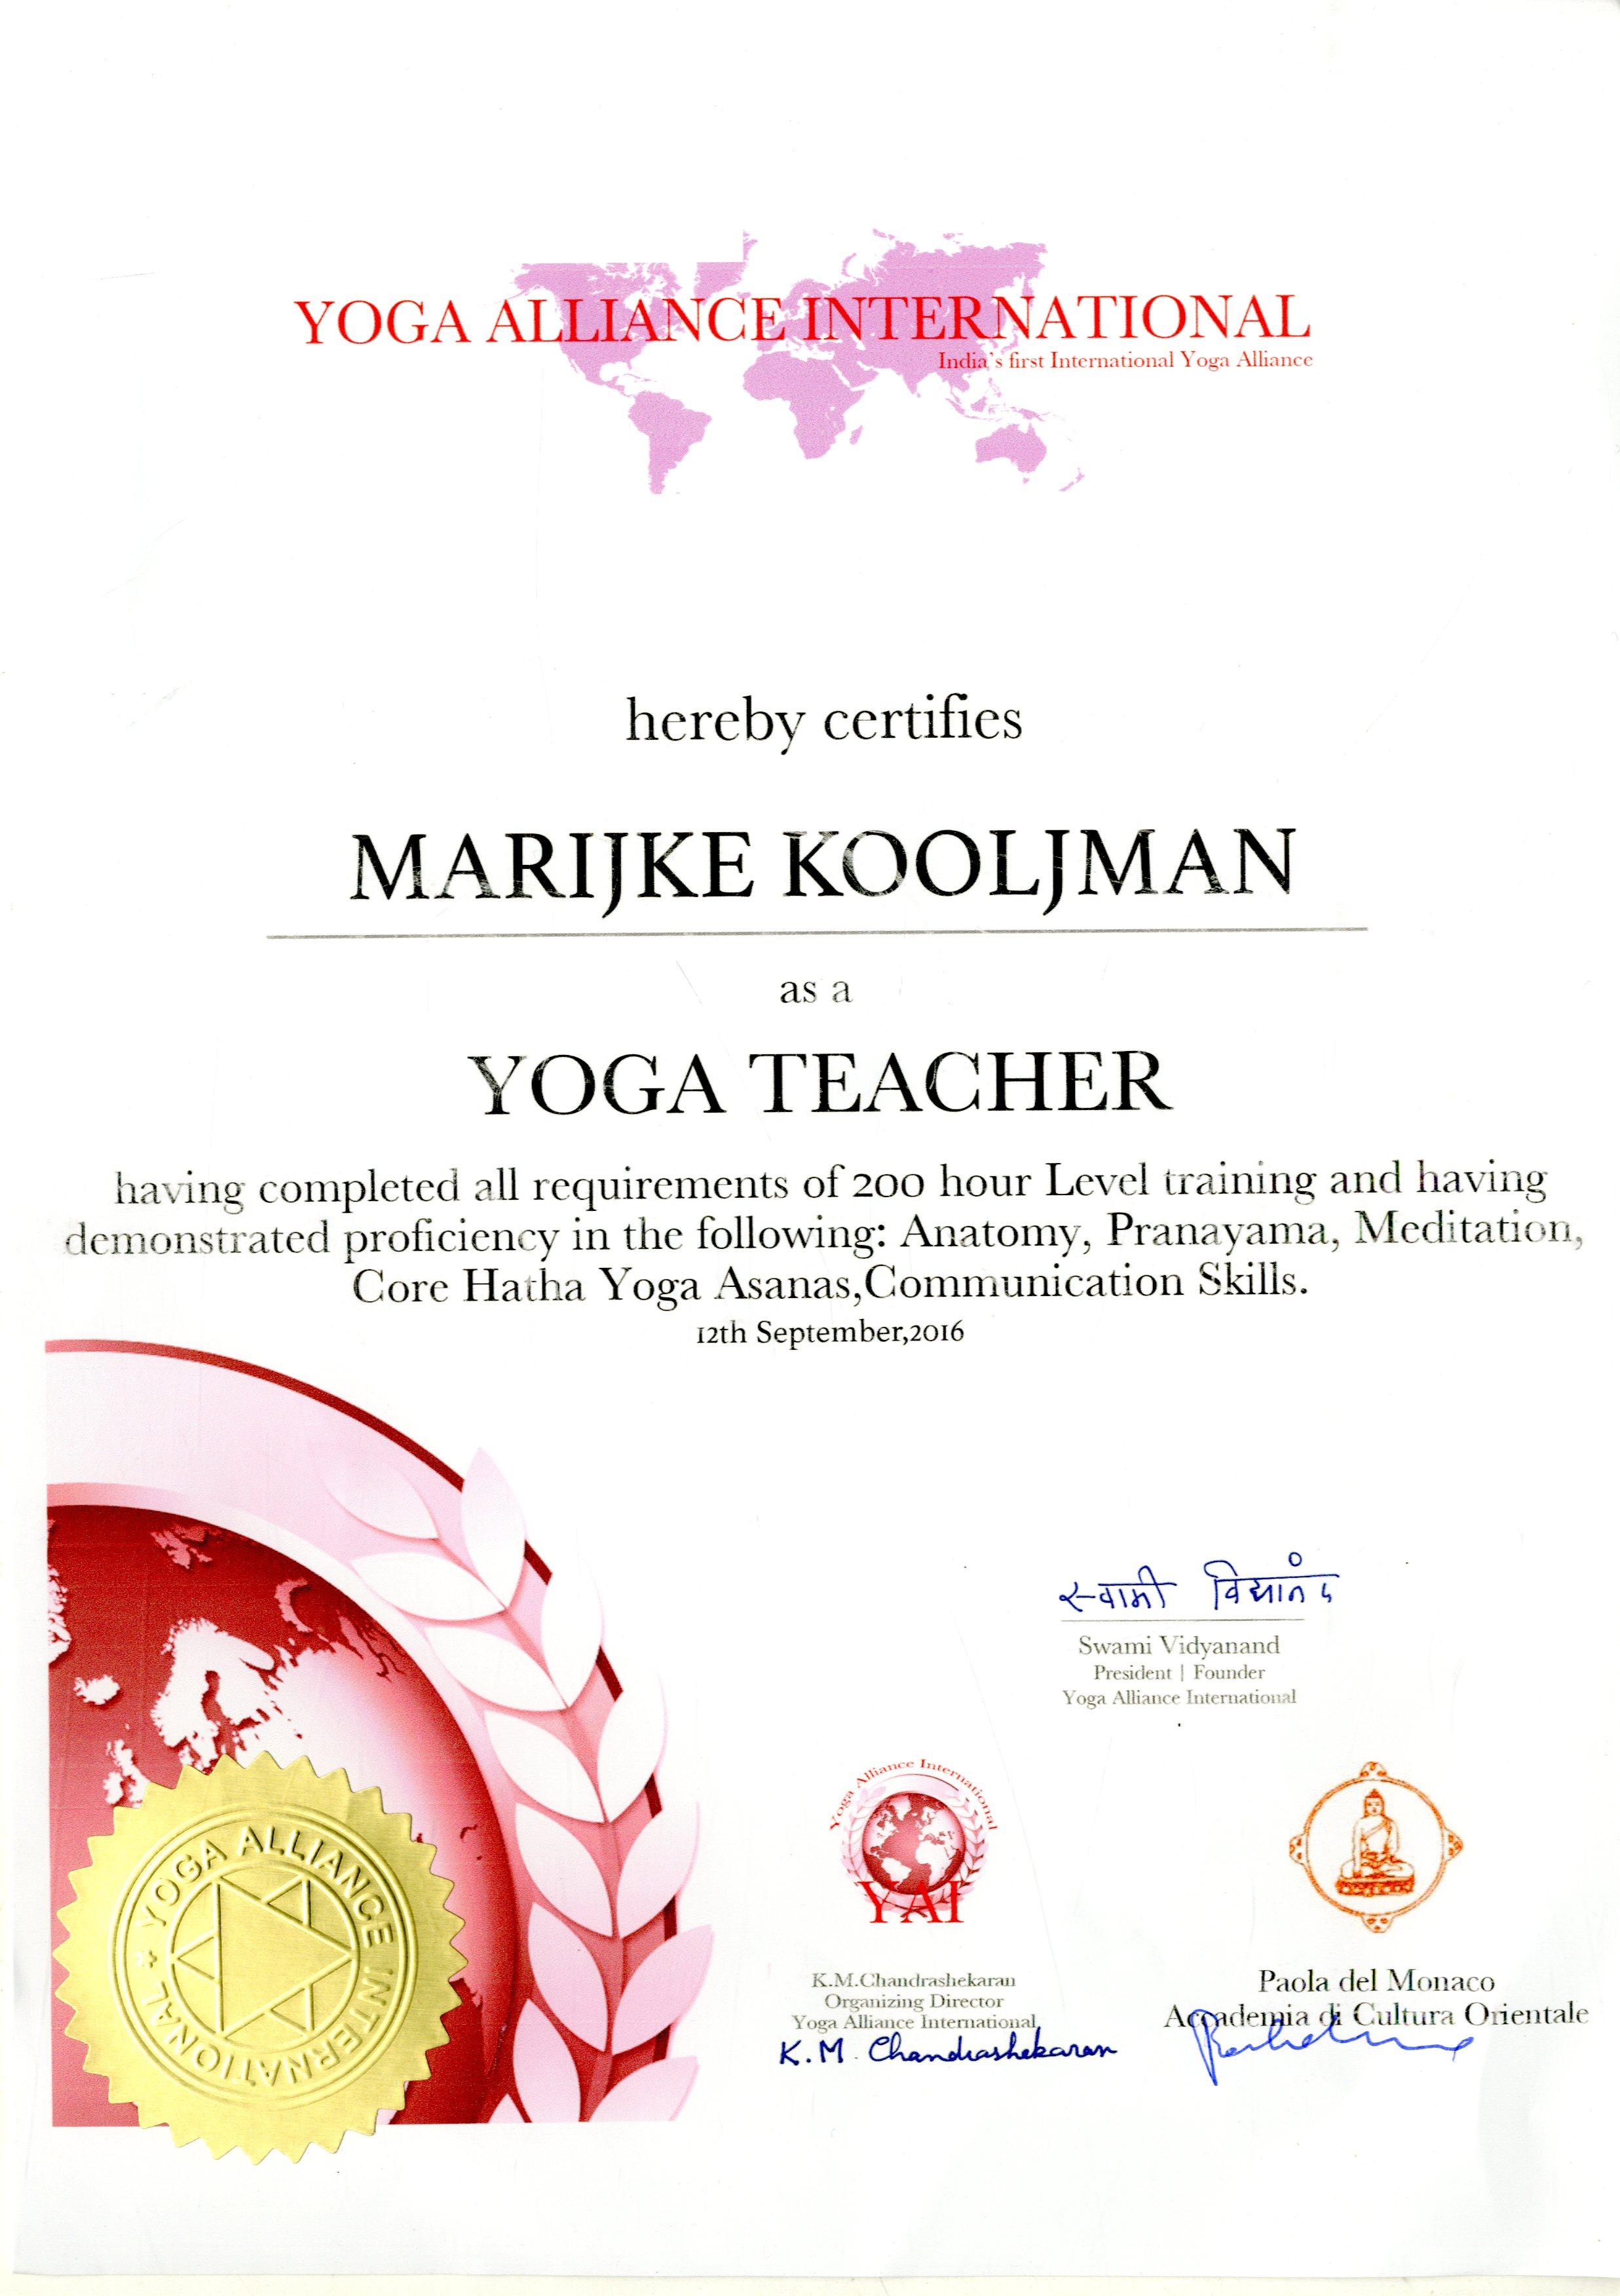 Diploma Yoga Alliance International (click for the full image)